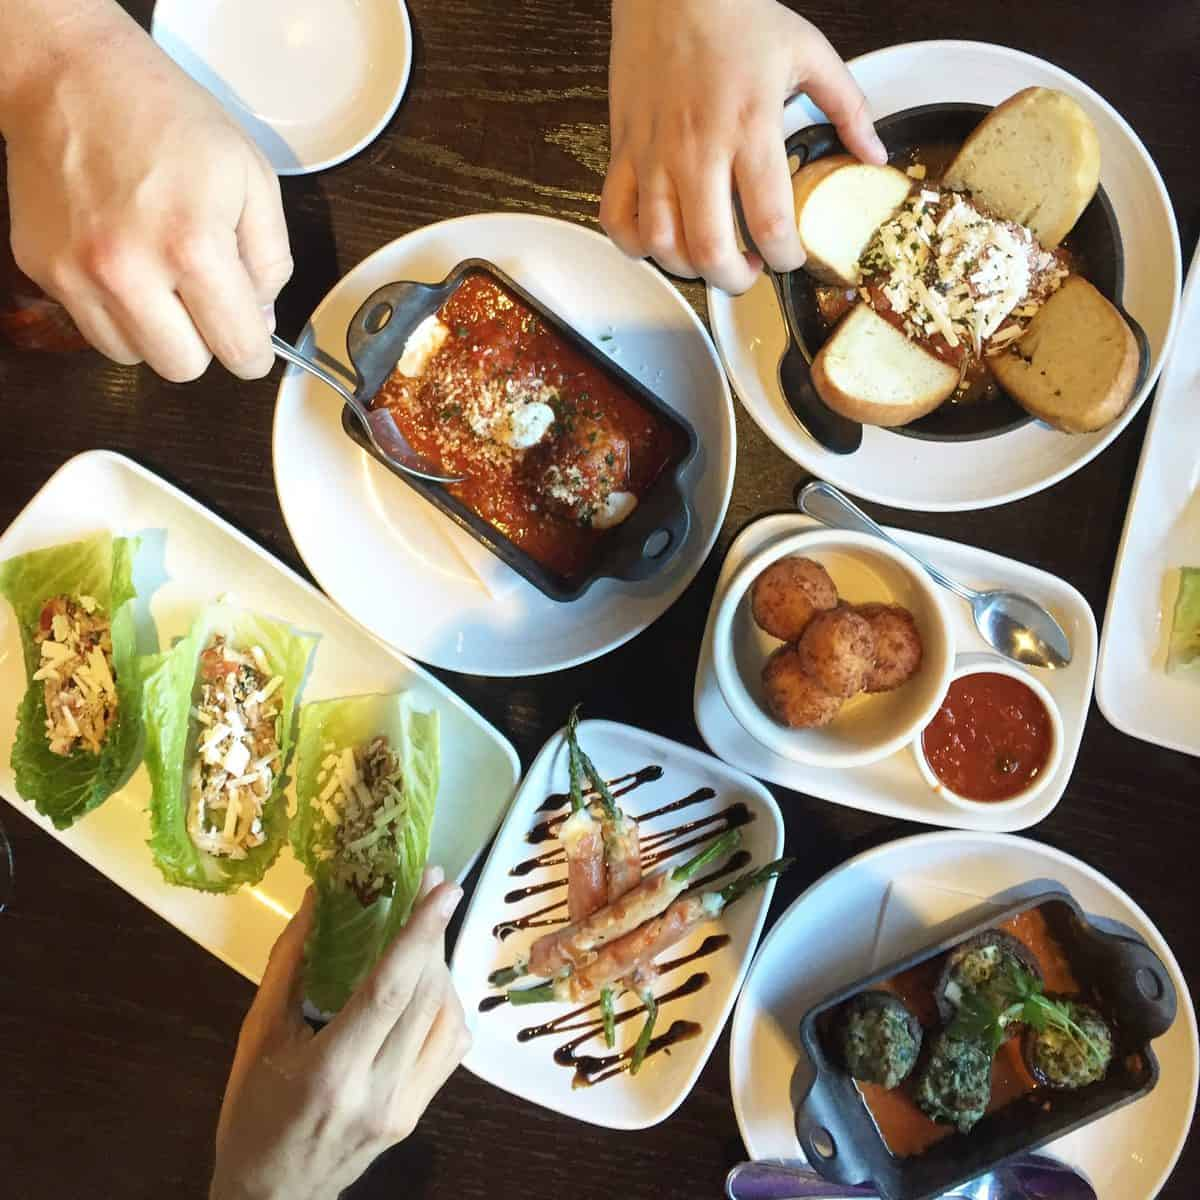 Carrabba's Small Plates